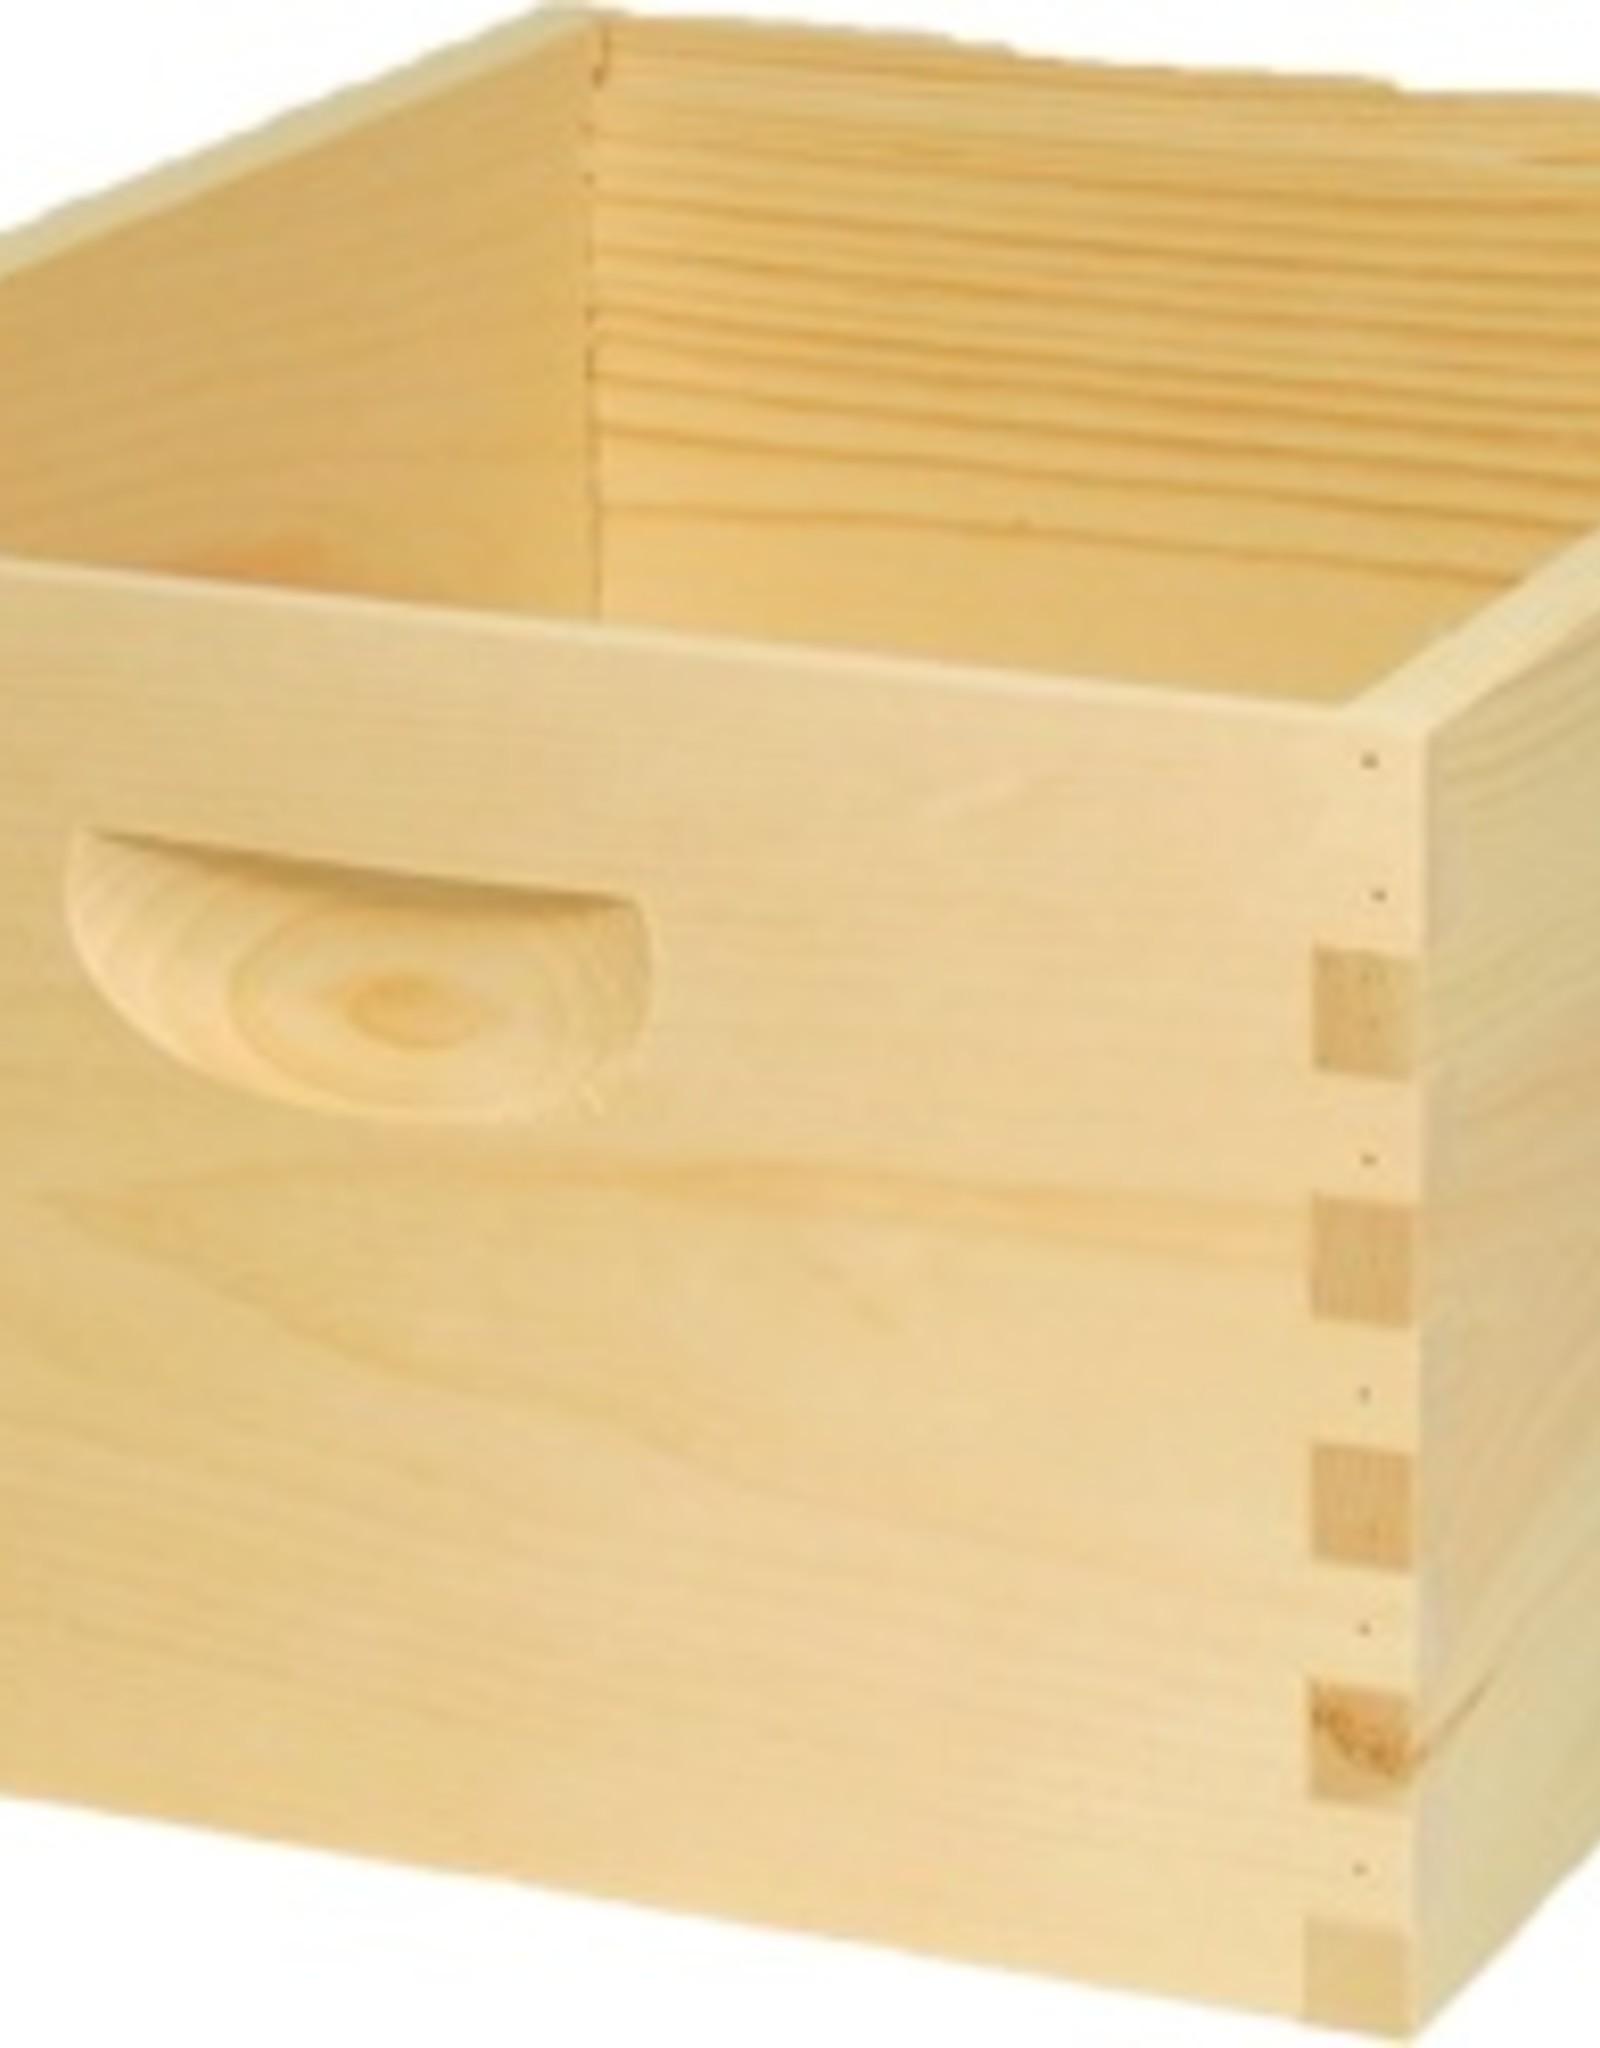 *8-Frame Deep Hive Body, Assembled